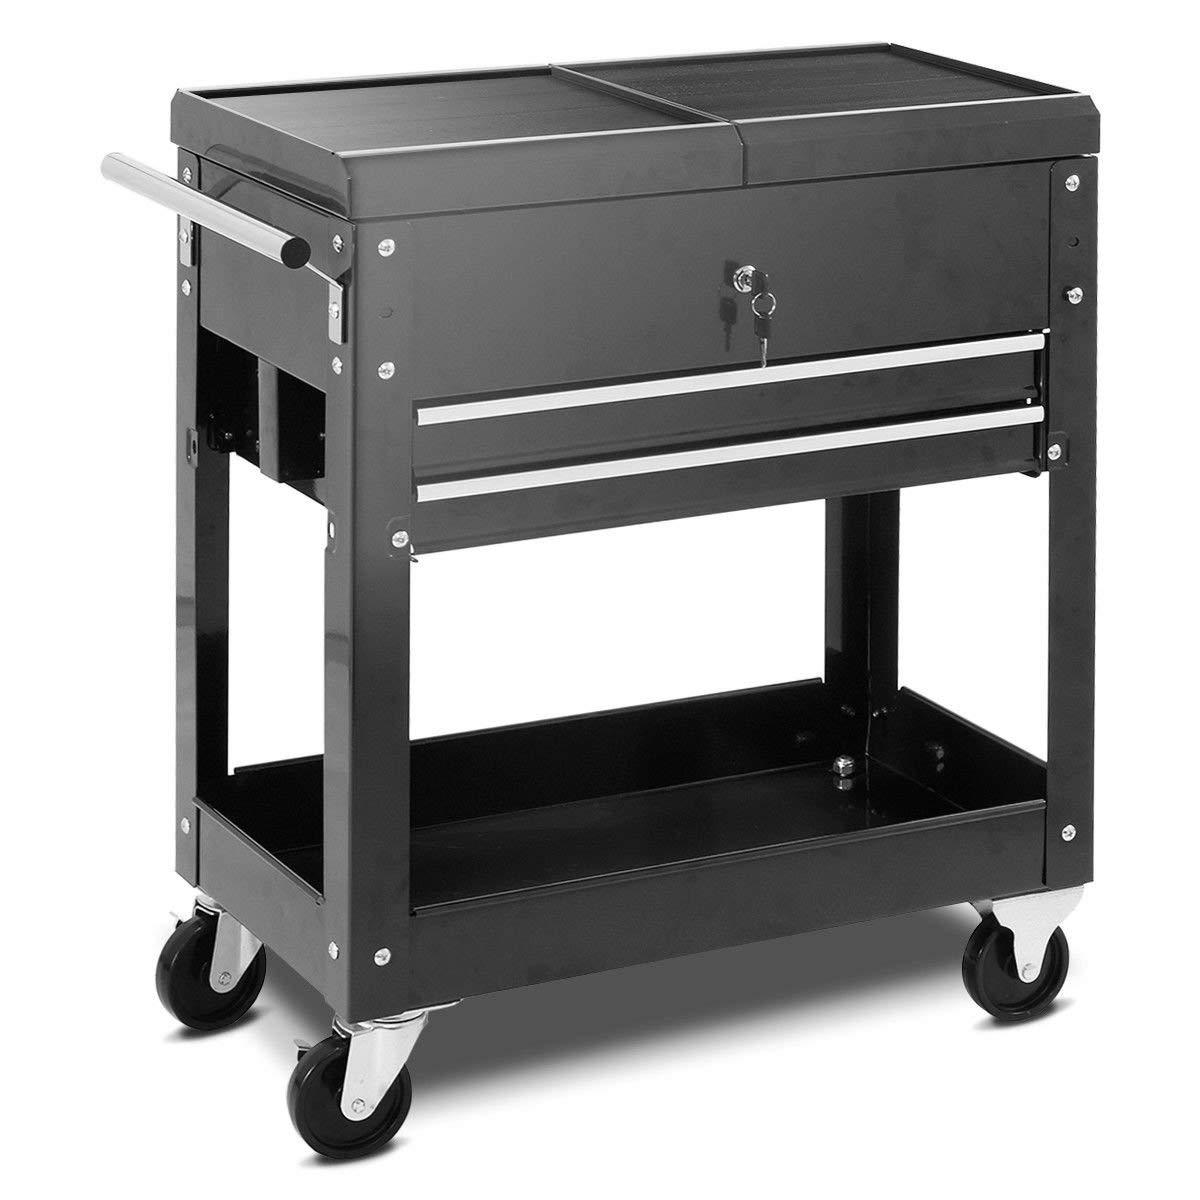 Cypressshop Mechanics Tool Cart Slide Top Rolling Utility Trolley Storage Cabinet Organizer 2 Drawers Worksop Tools Garage Equipments Tool Boxes